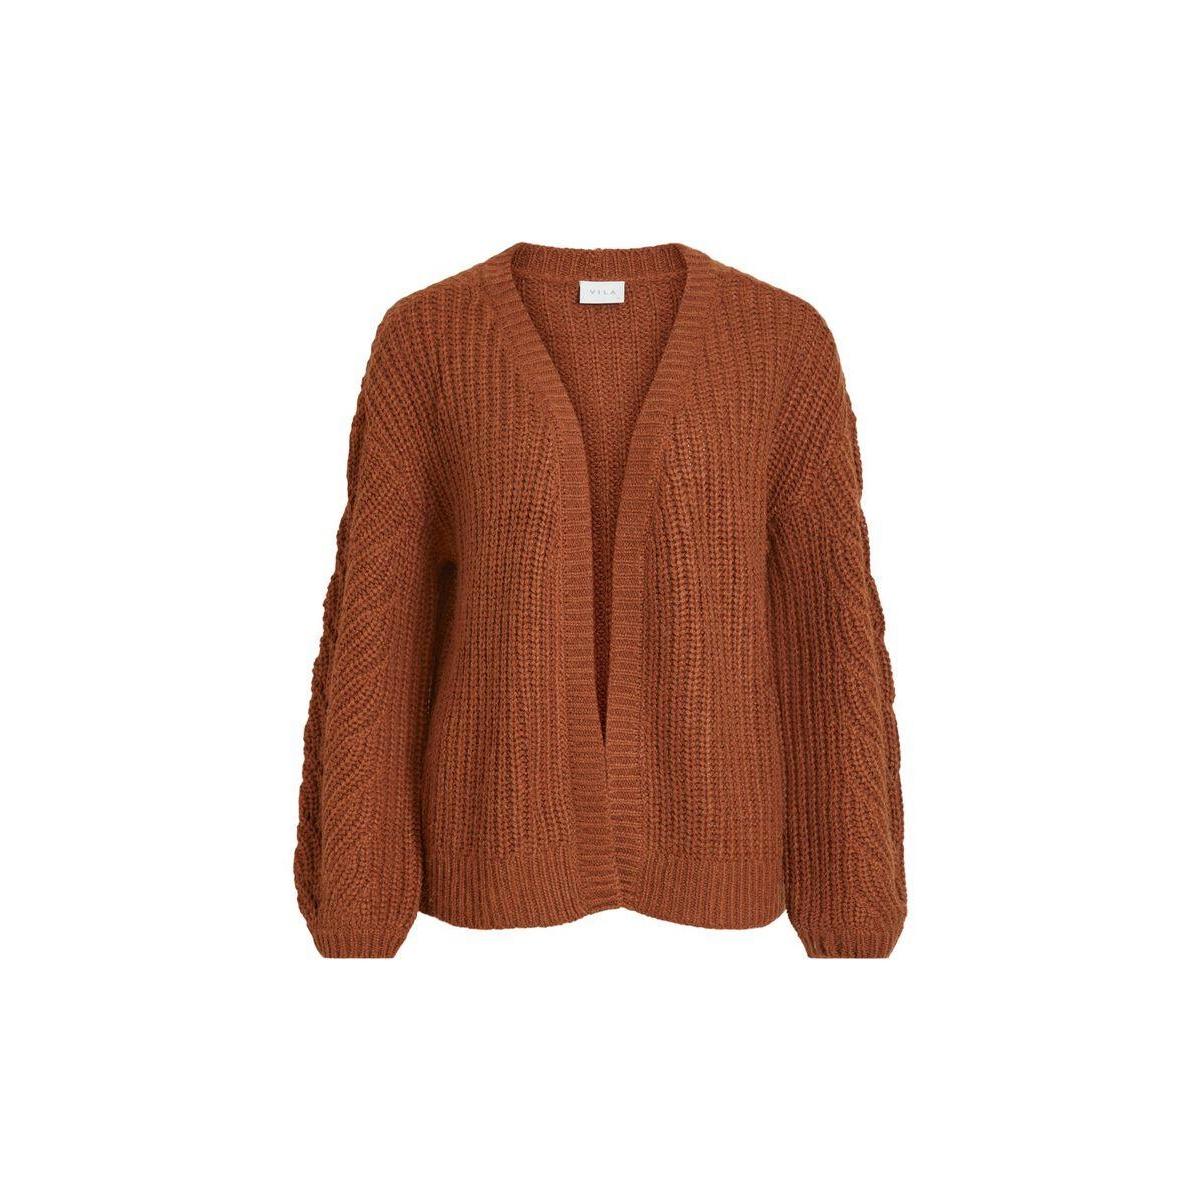 visee knit v-neck l/s cardigan 14058255 vila vest tortoise shell